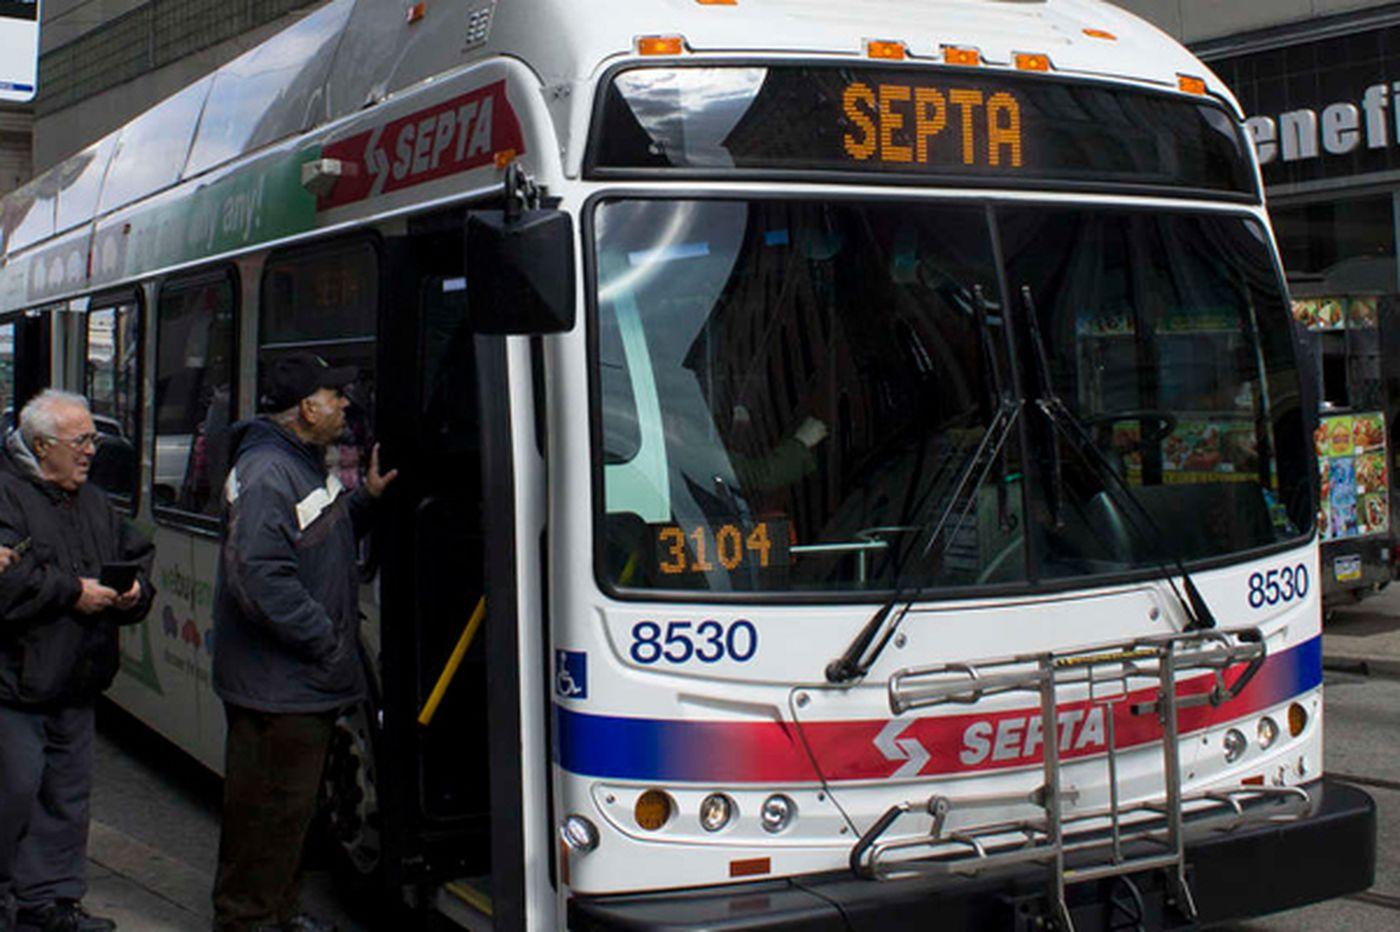 SEPTA warns of 'devastating' cuts